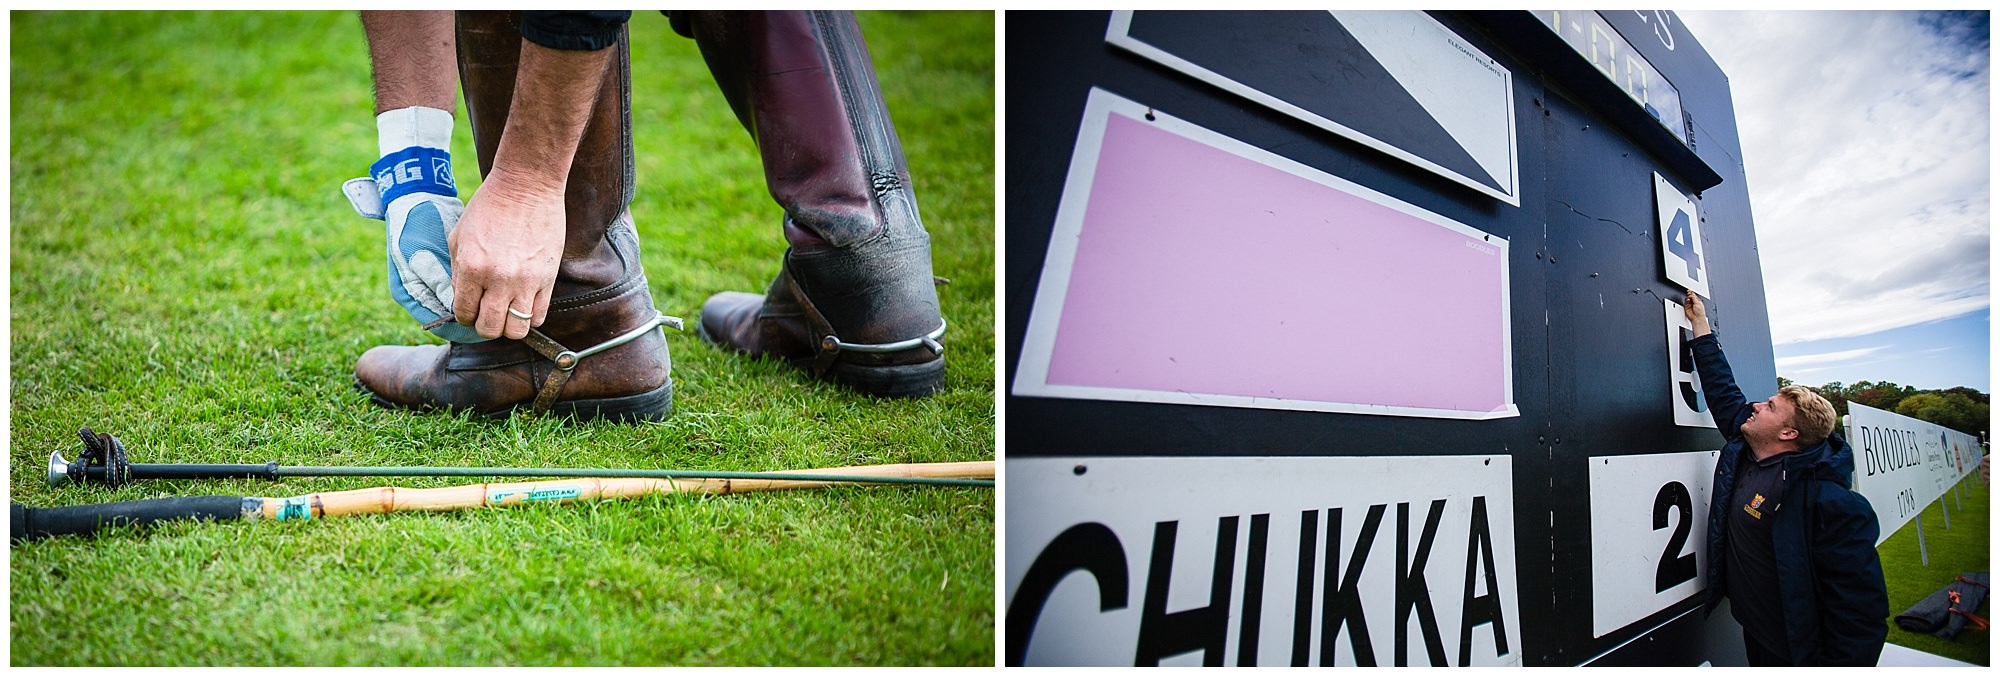 score board during a chukka - chester race course photographer